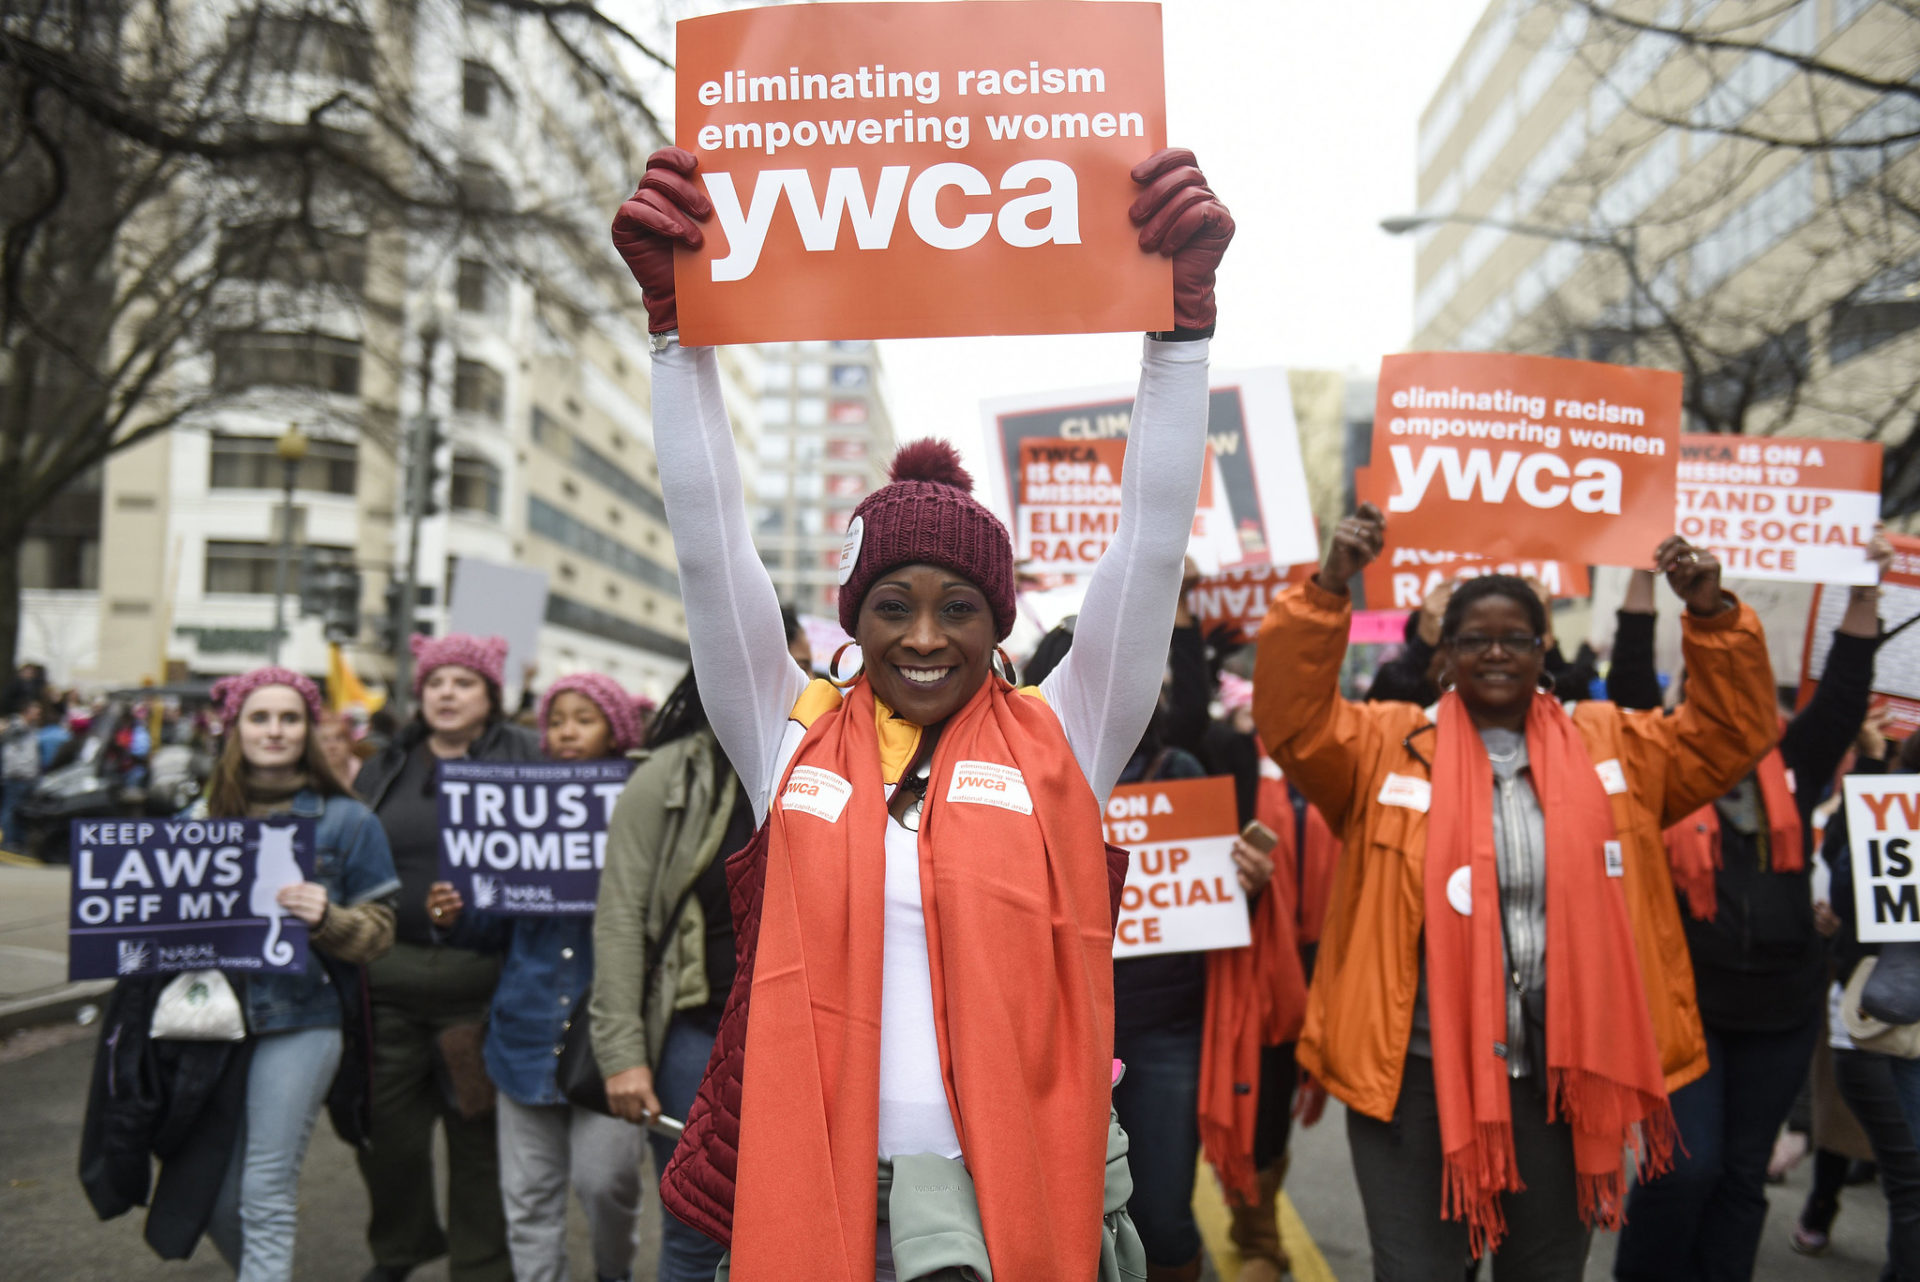 YWCA-MC February Event